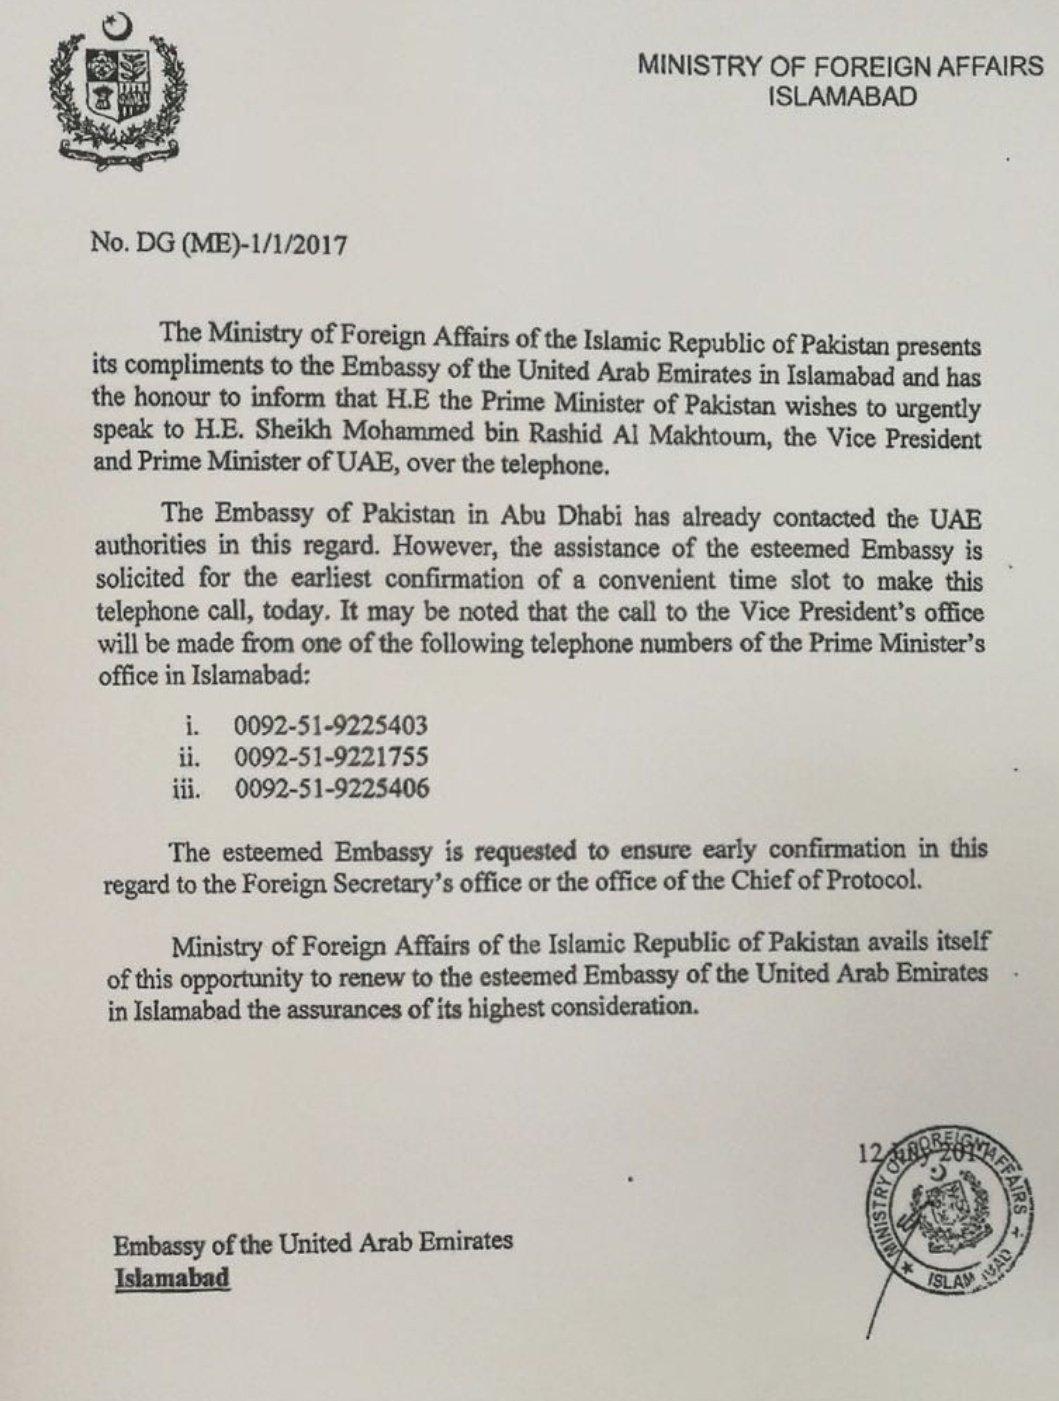 Pakistan Foreign Office letter to the United Arab Emirates (UAE) regarding Prime Minister Nawaz Sharif wish to contact Sheikh Mohammed bin Rashid Al Makhtoum | pakistantribe.com